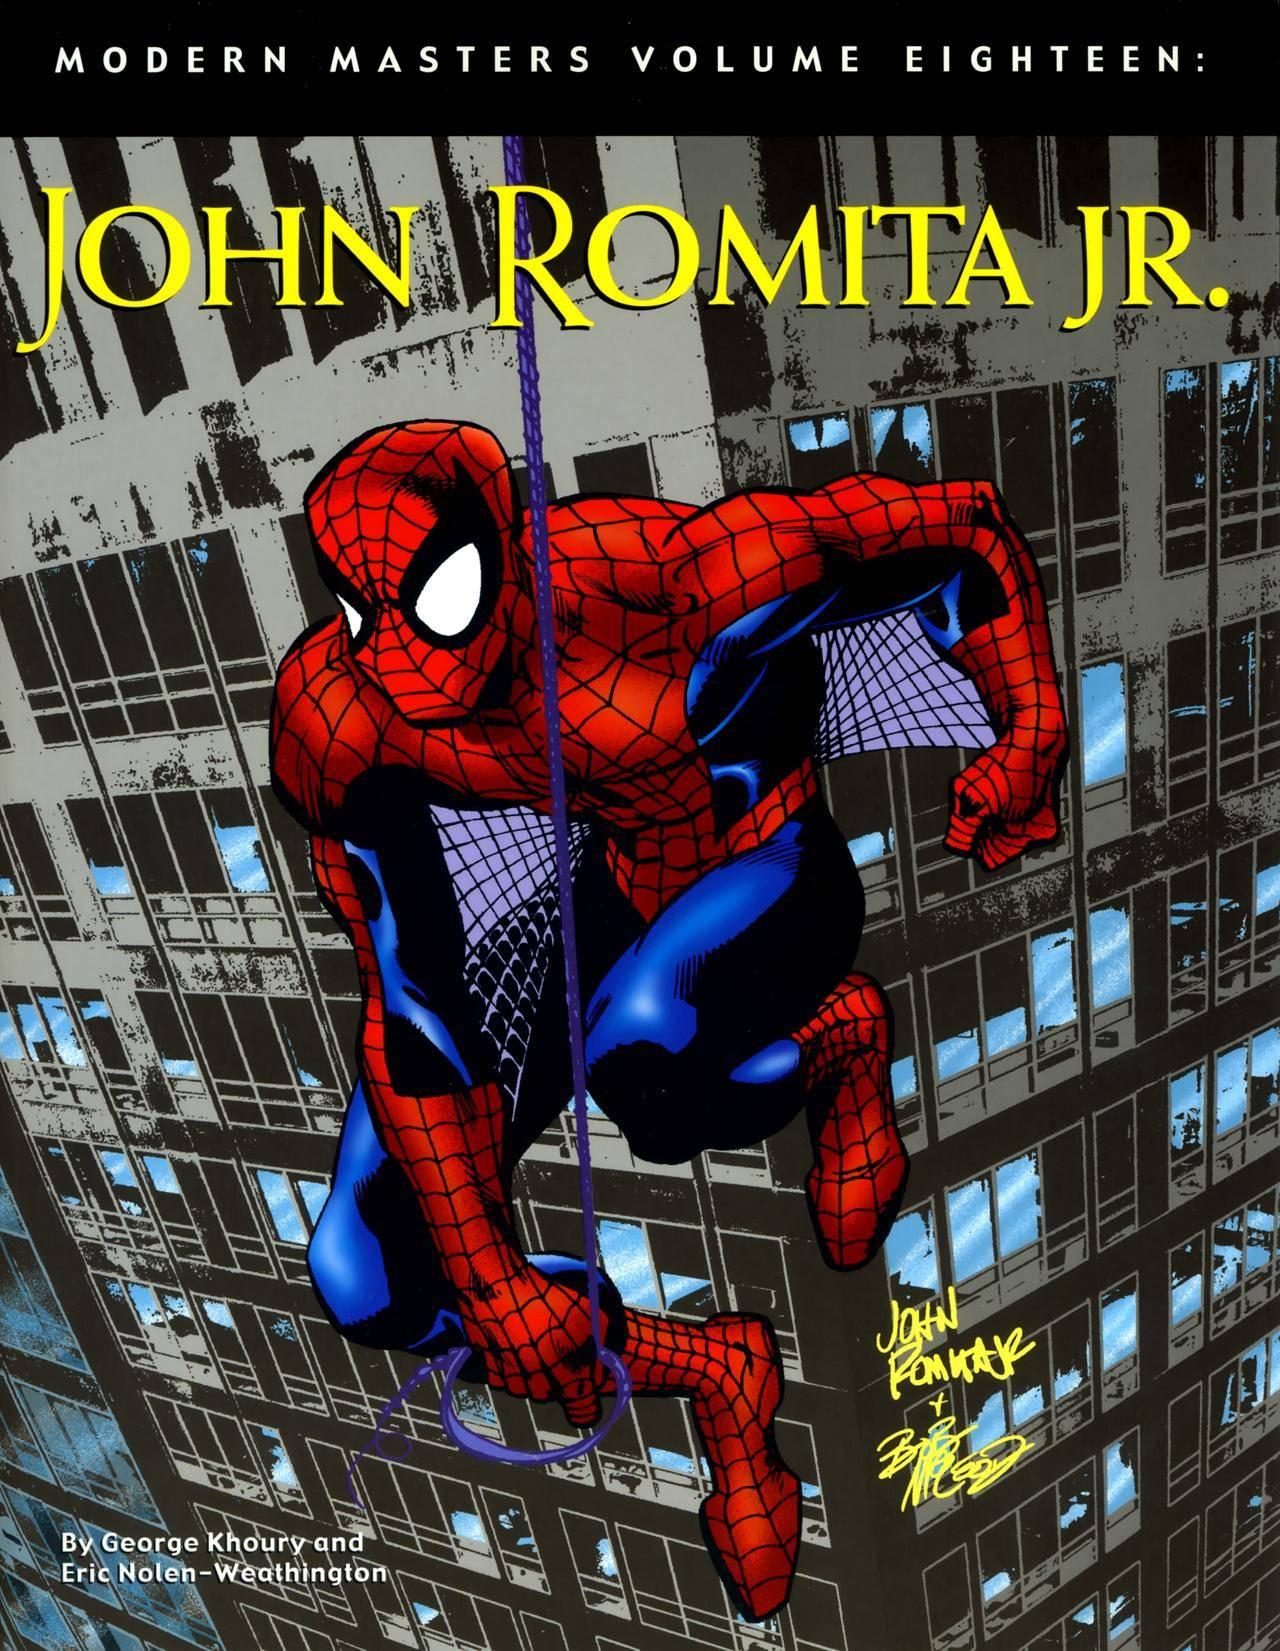 Modern Masters Vol 18 - John Romita Jr ArtNet - DCP